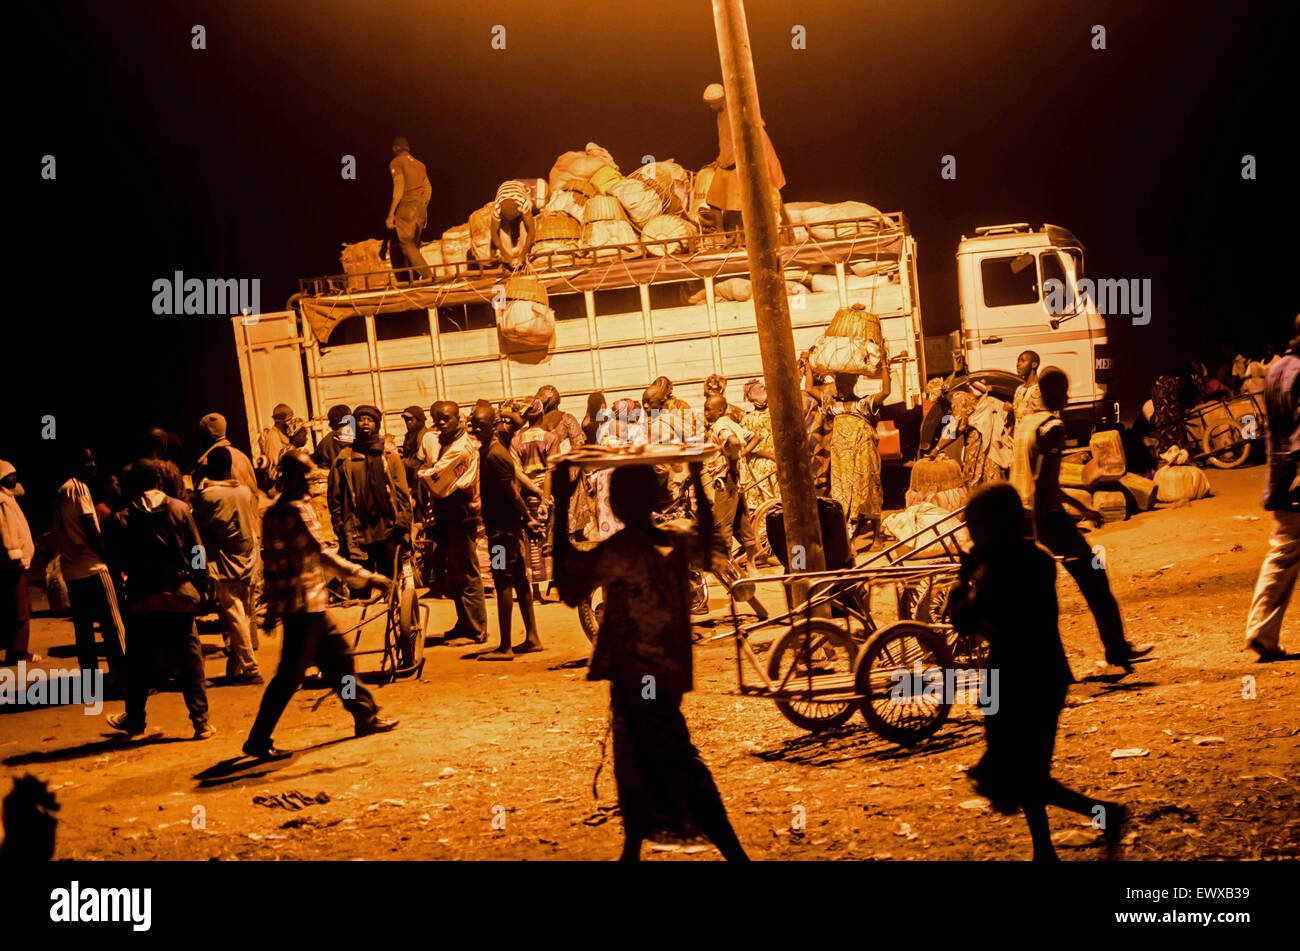 Bushaltestelle in Djenne, Mali, in der Nacht Stockfoto